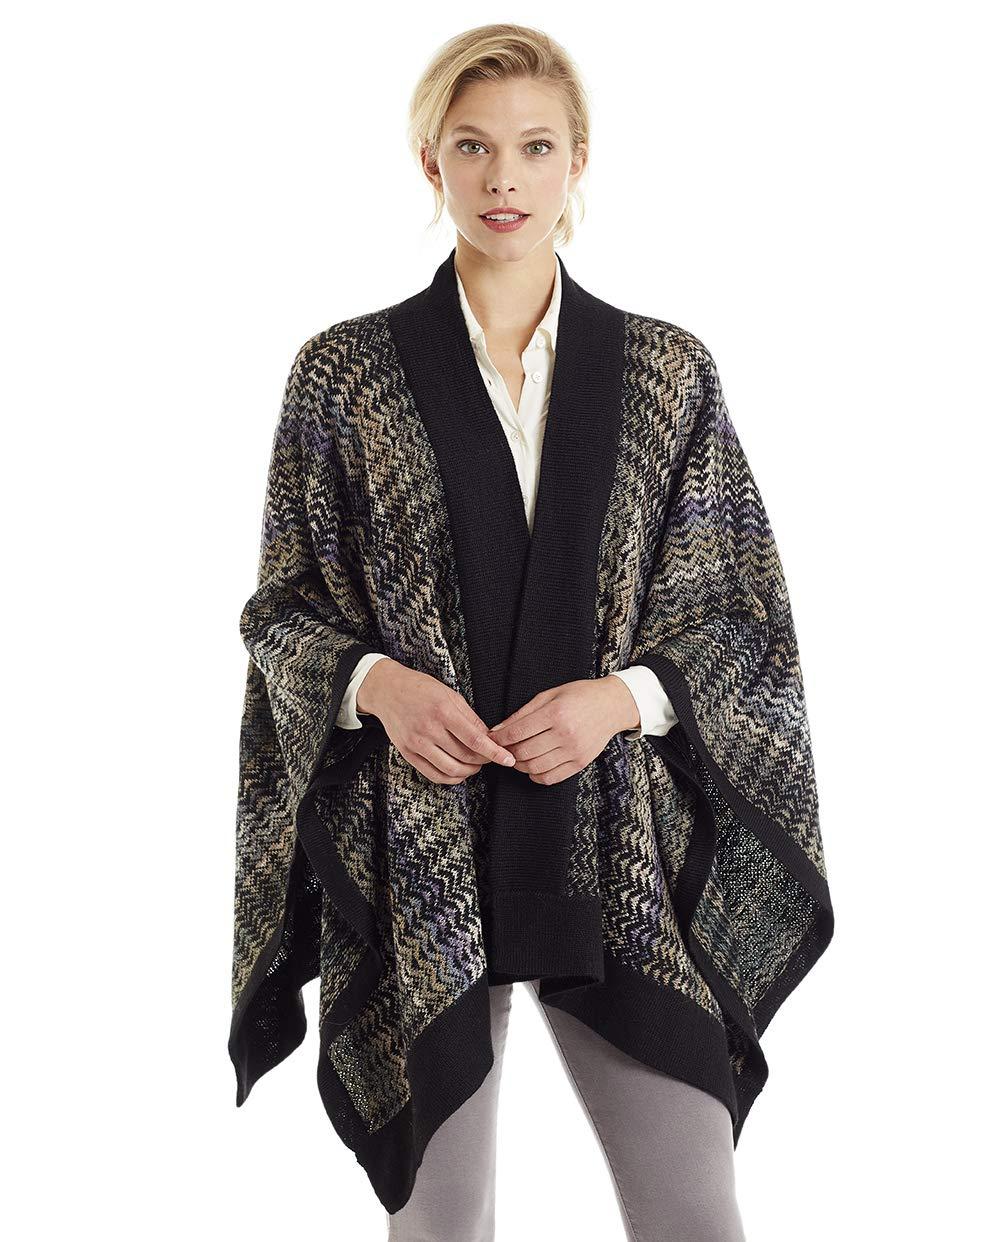 Invisible World Women's Knit 100% Alpaca Wool Poncho Ruana Wrap Noelle